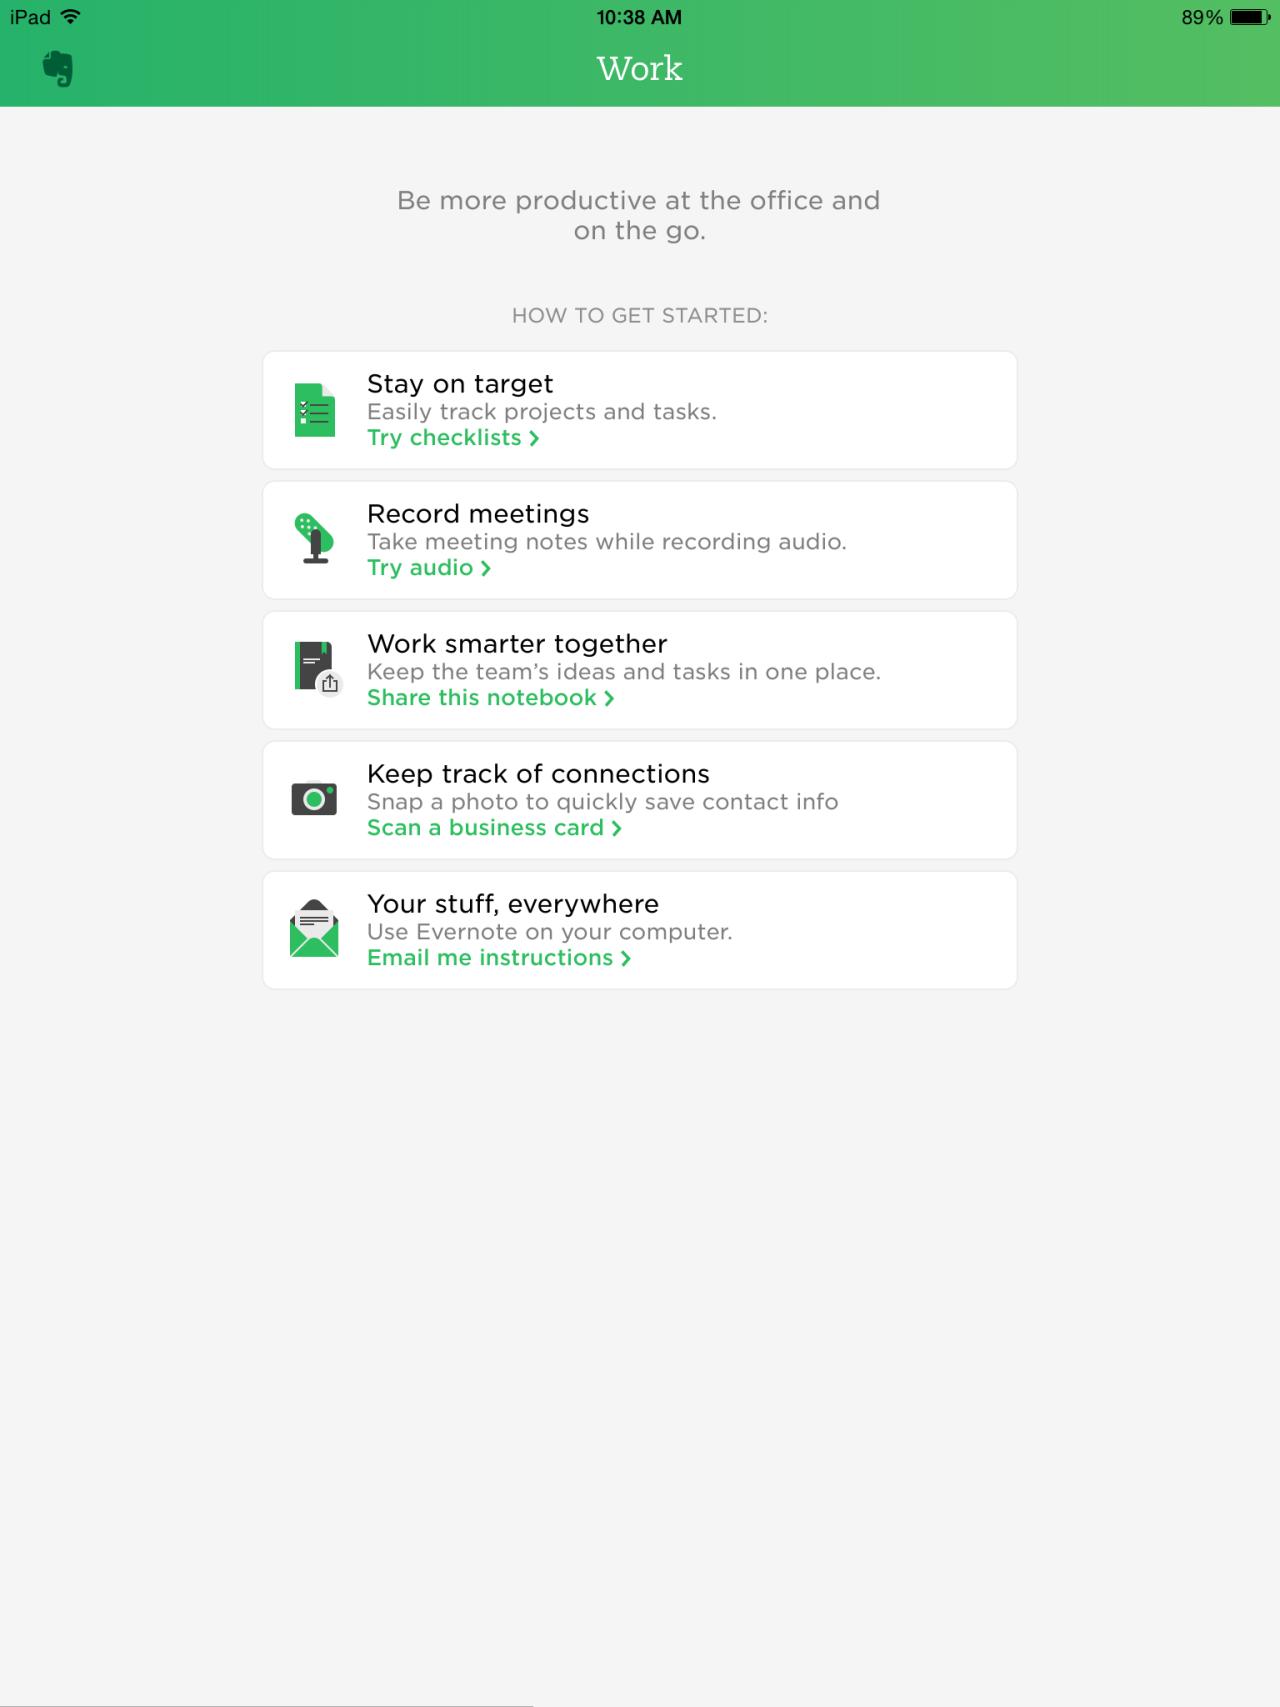 Inspired UI - Mobile Apps Design Patterns [iPad] | UI Help ...